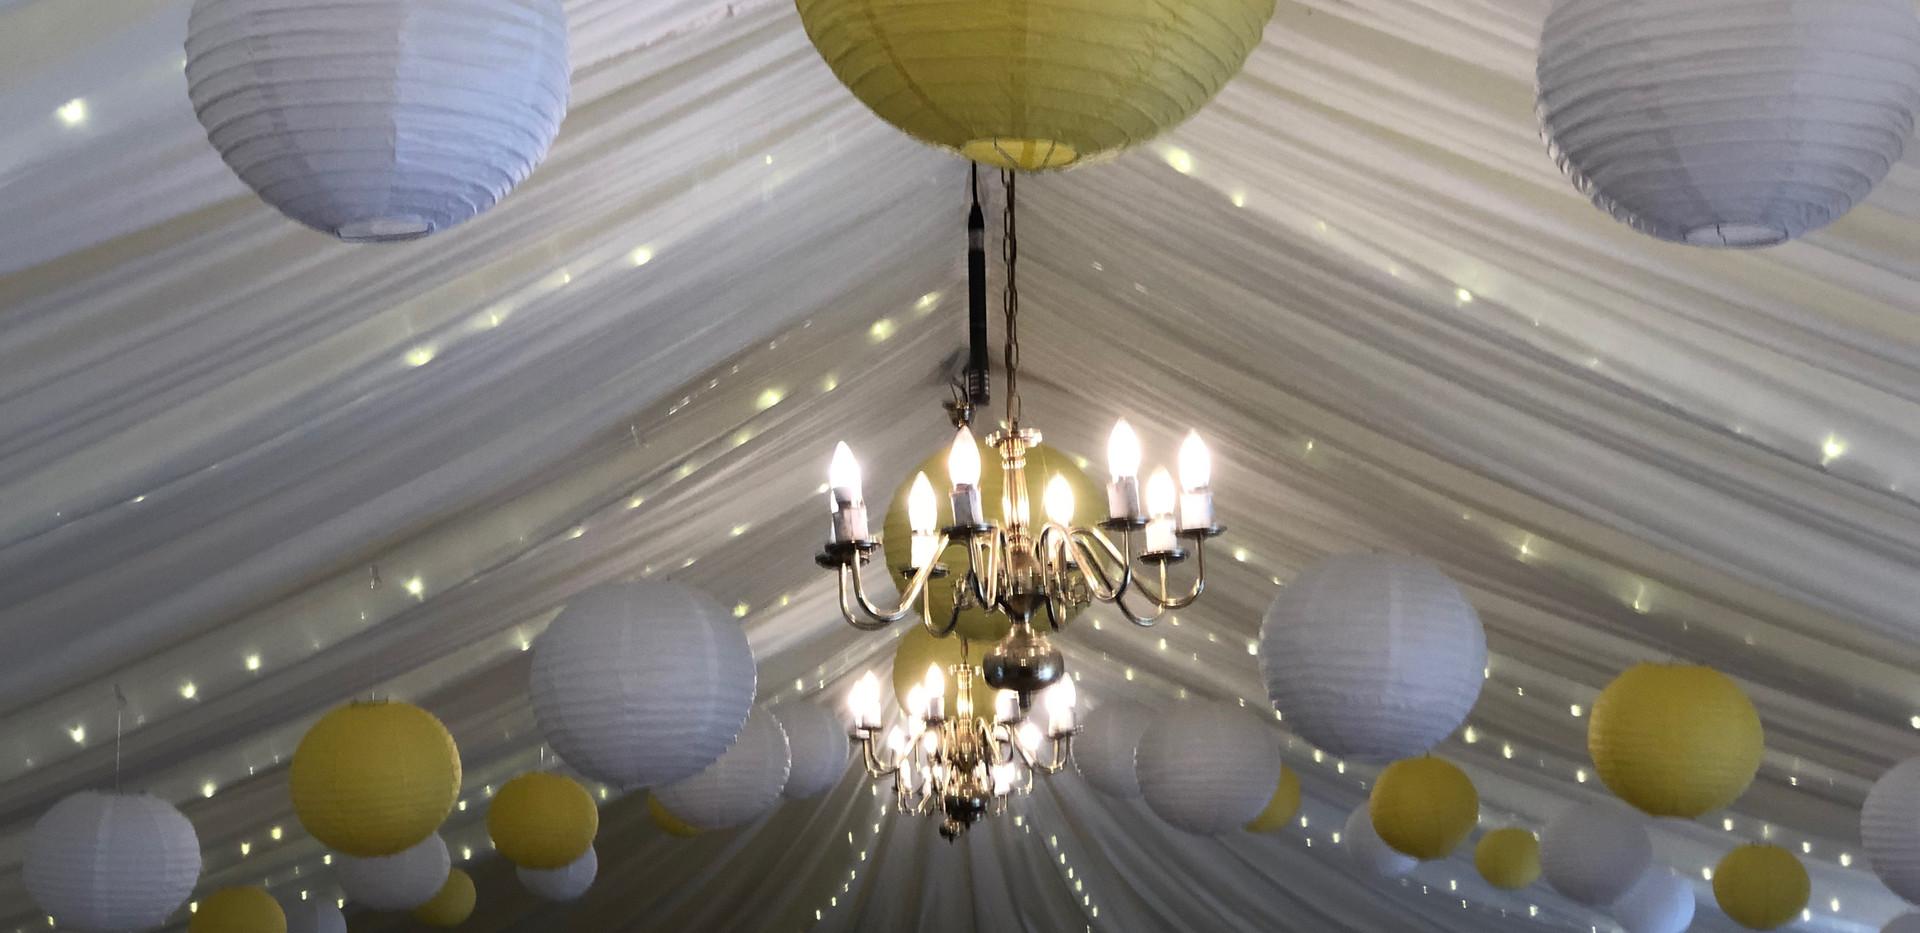 Lemon paper lanterns